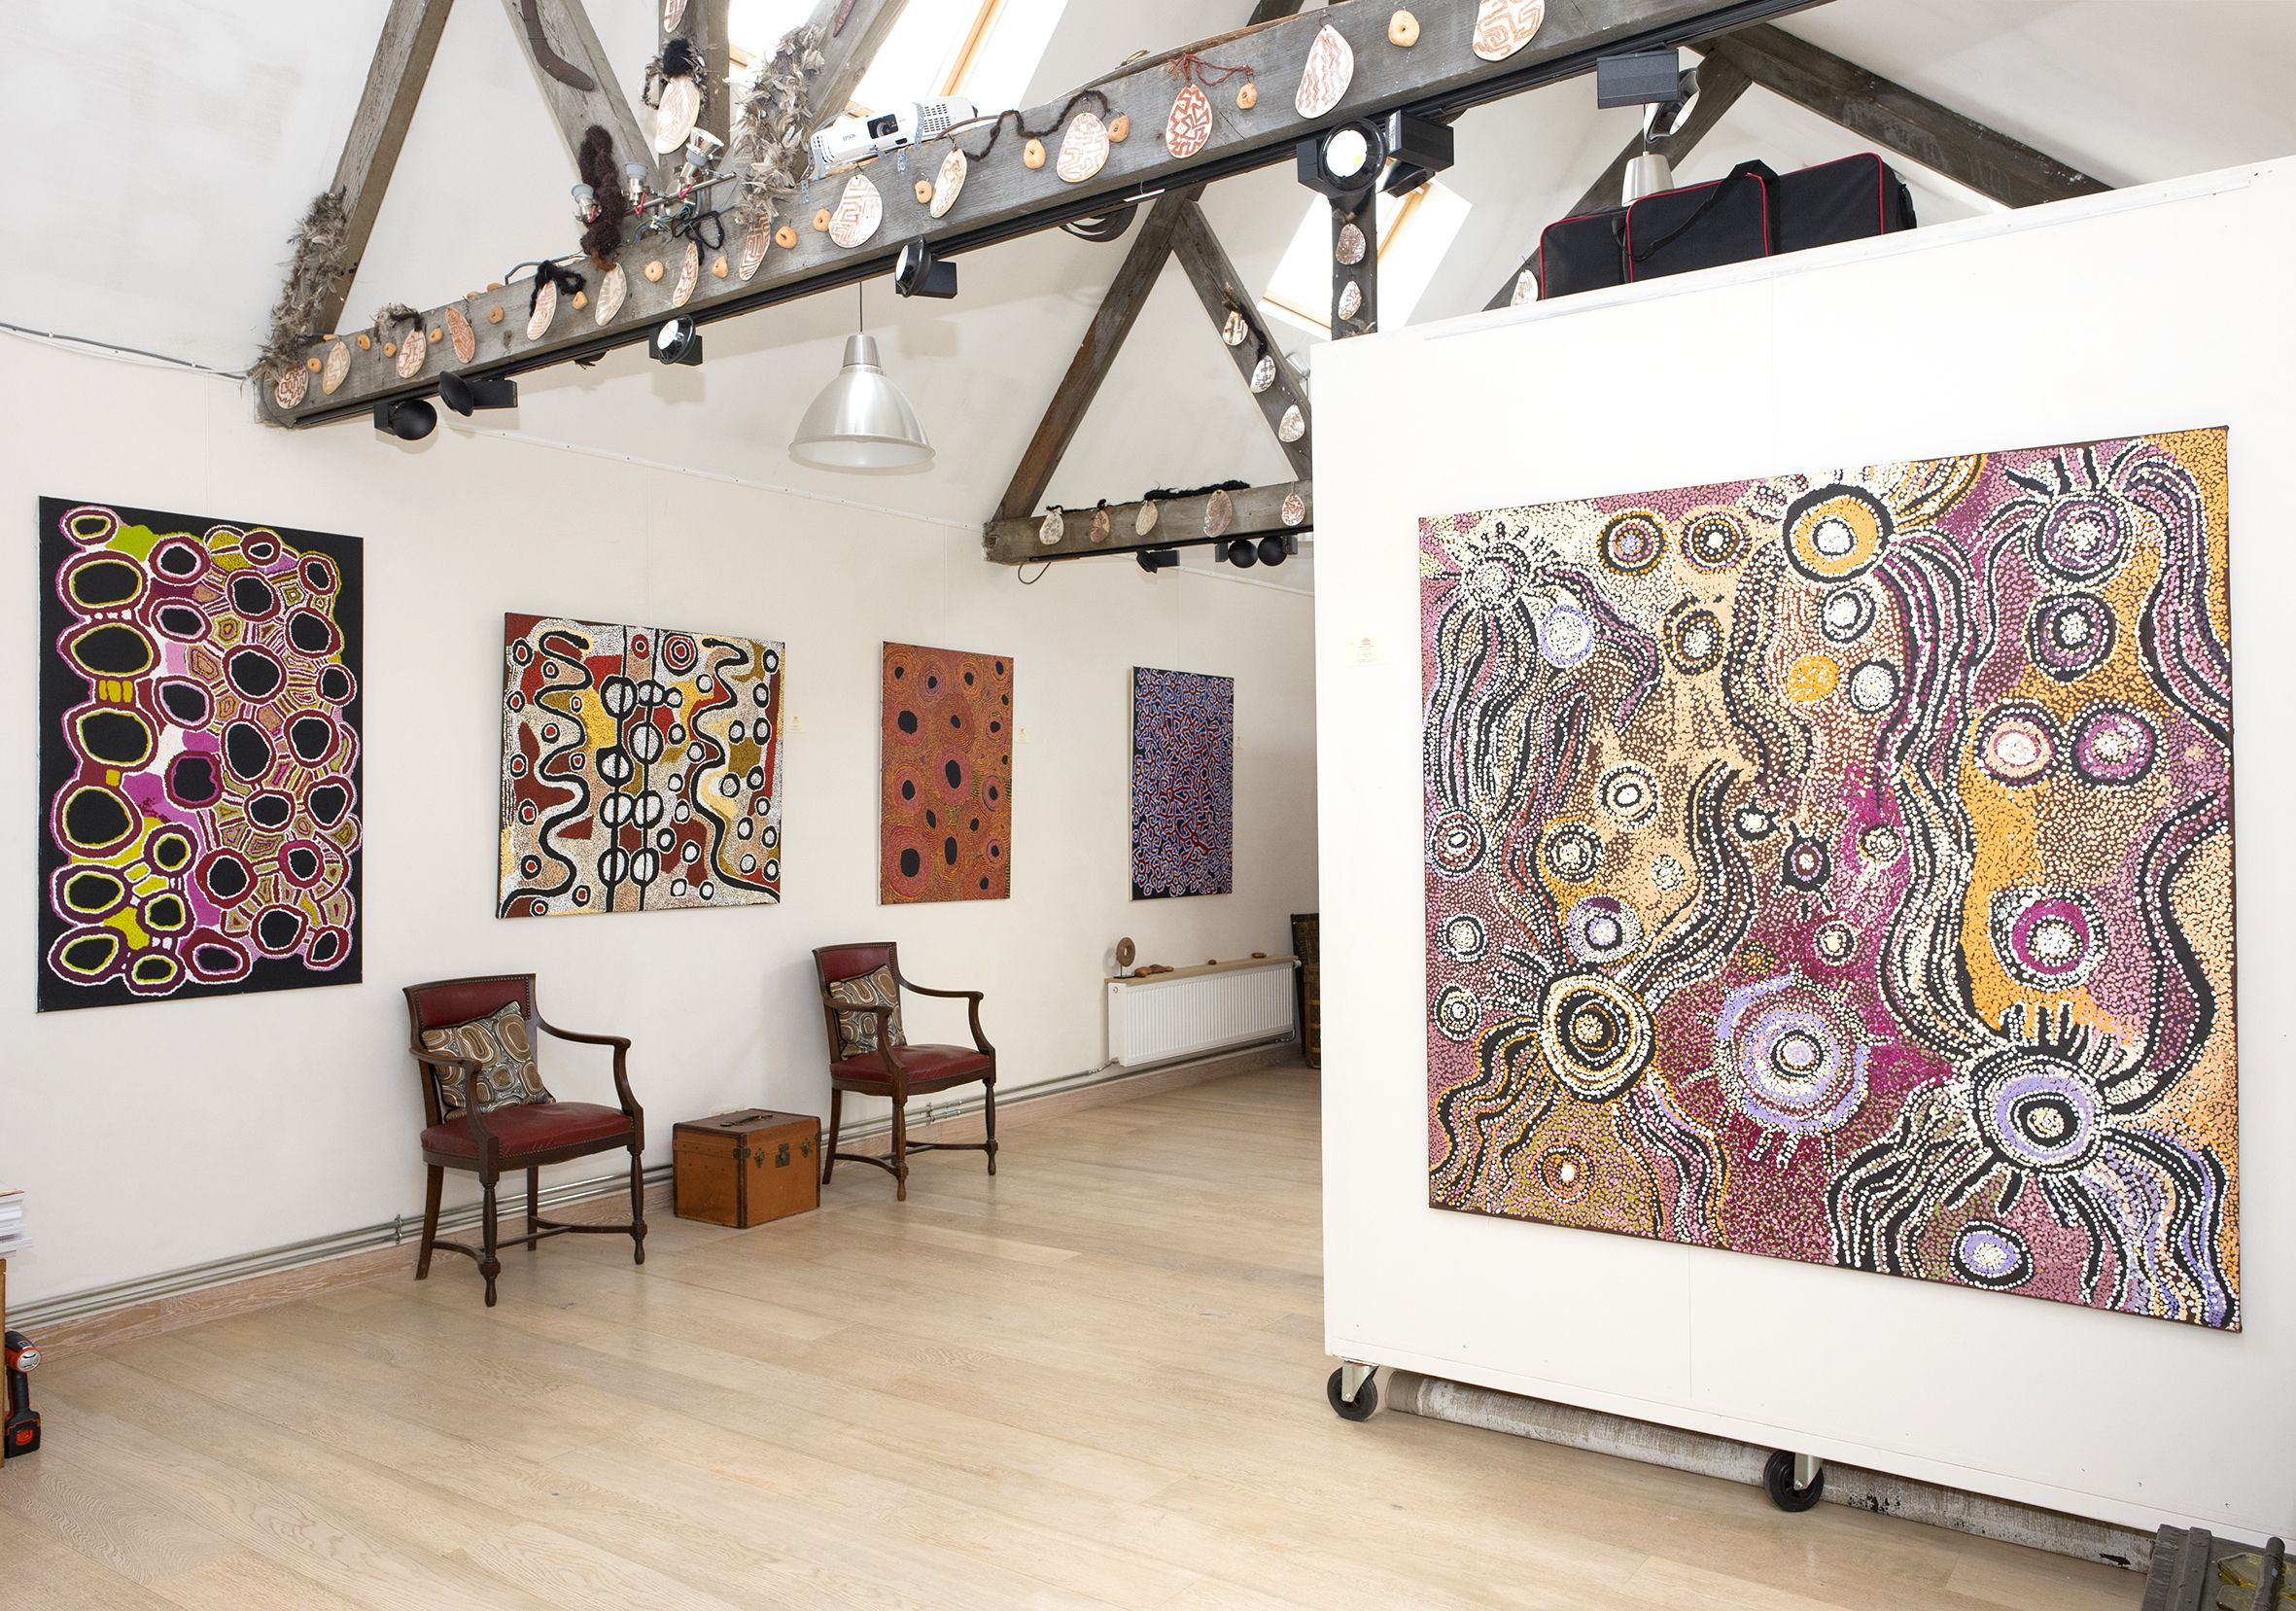 Vue de l'exposition d'art Aborigène Gems from the remote deserts jusqu'au 16 décembre à Bruxelles. © Photo : Aboriginal Signature gallery, with the courtesy of the artists and the art centres.